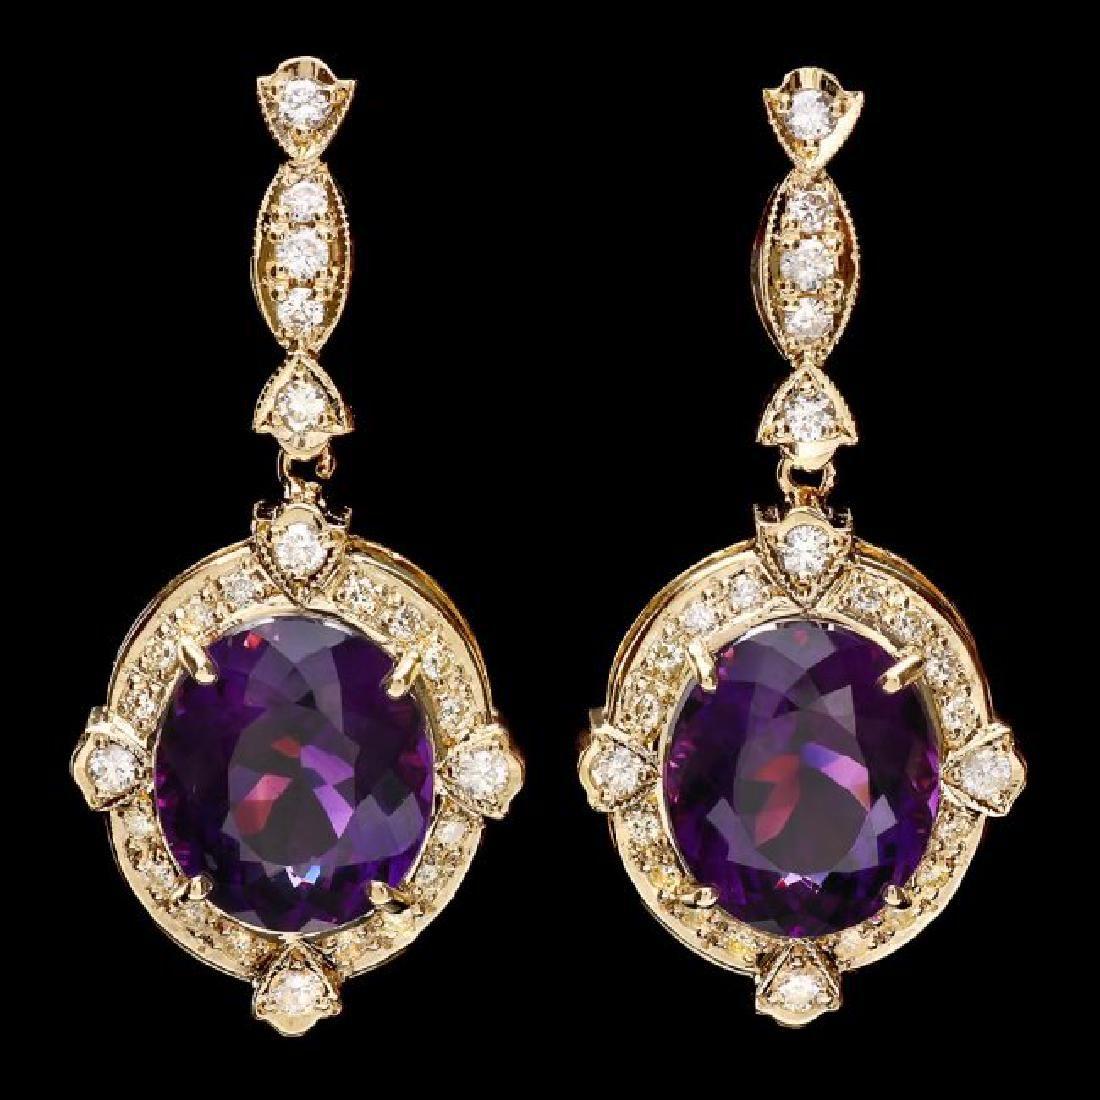 14k Gold 16ct Amethyst 1.45ct Diamond Earrings